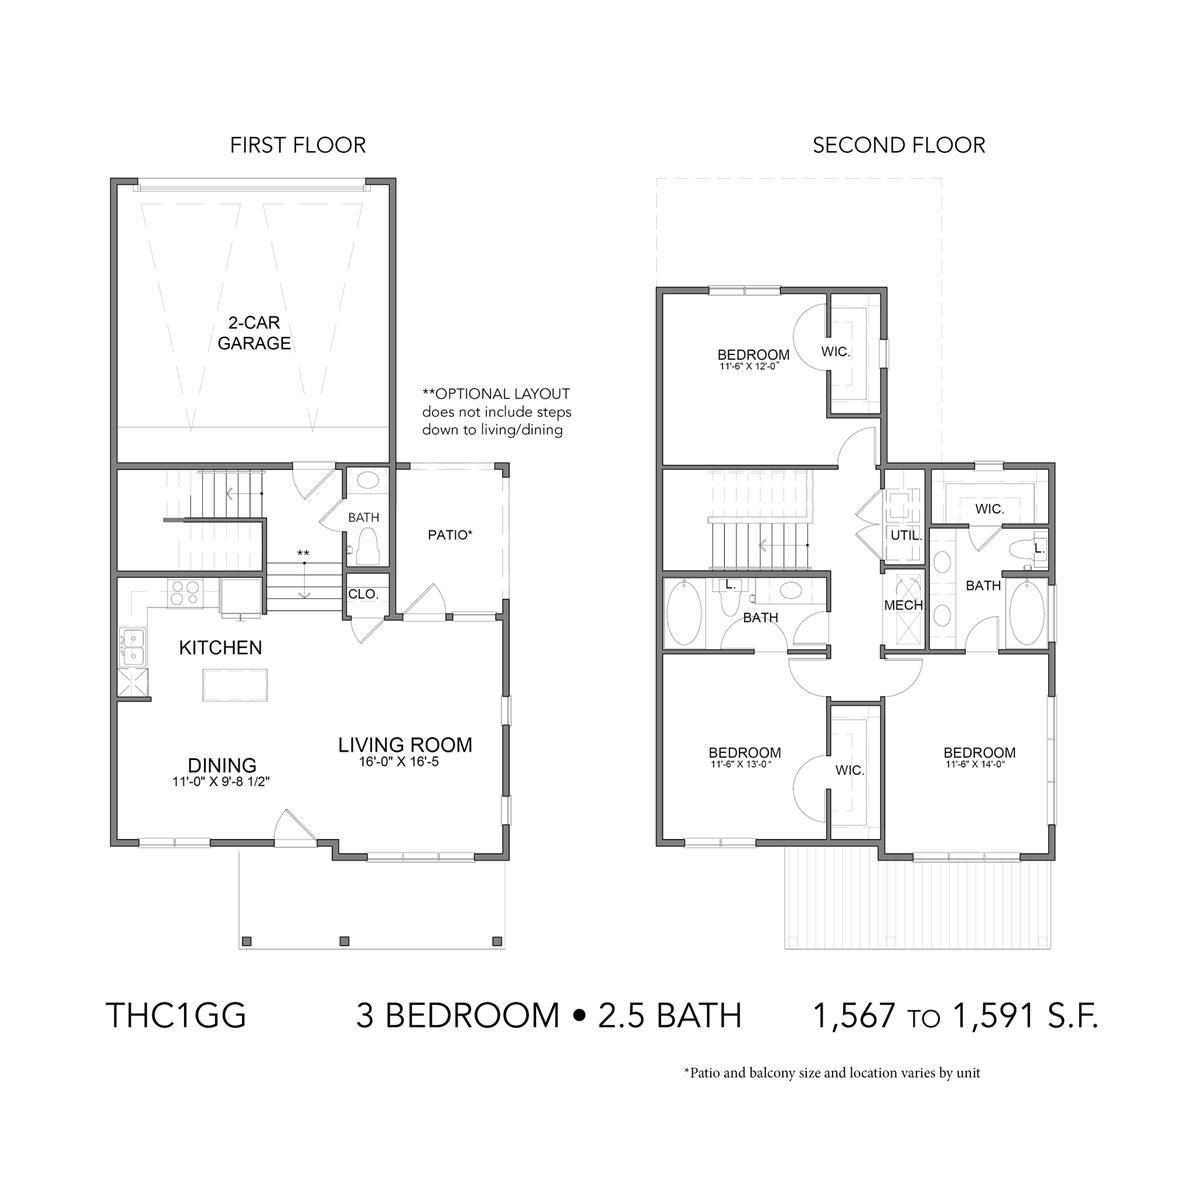 1,567 sq. ft. to 1,591 sq. ft. THC1GG floor plan